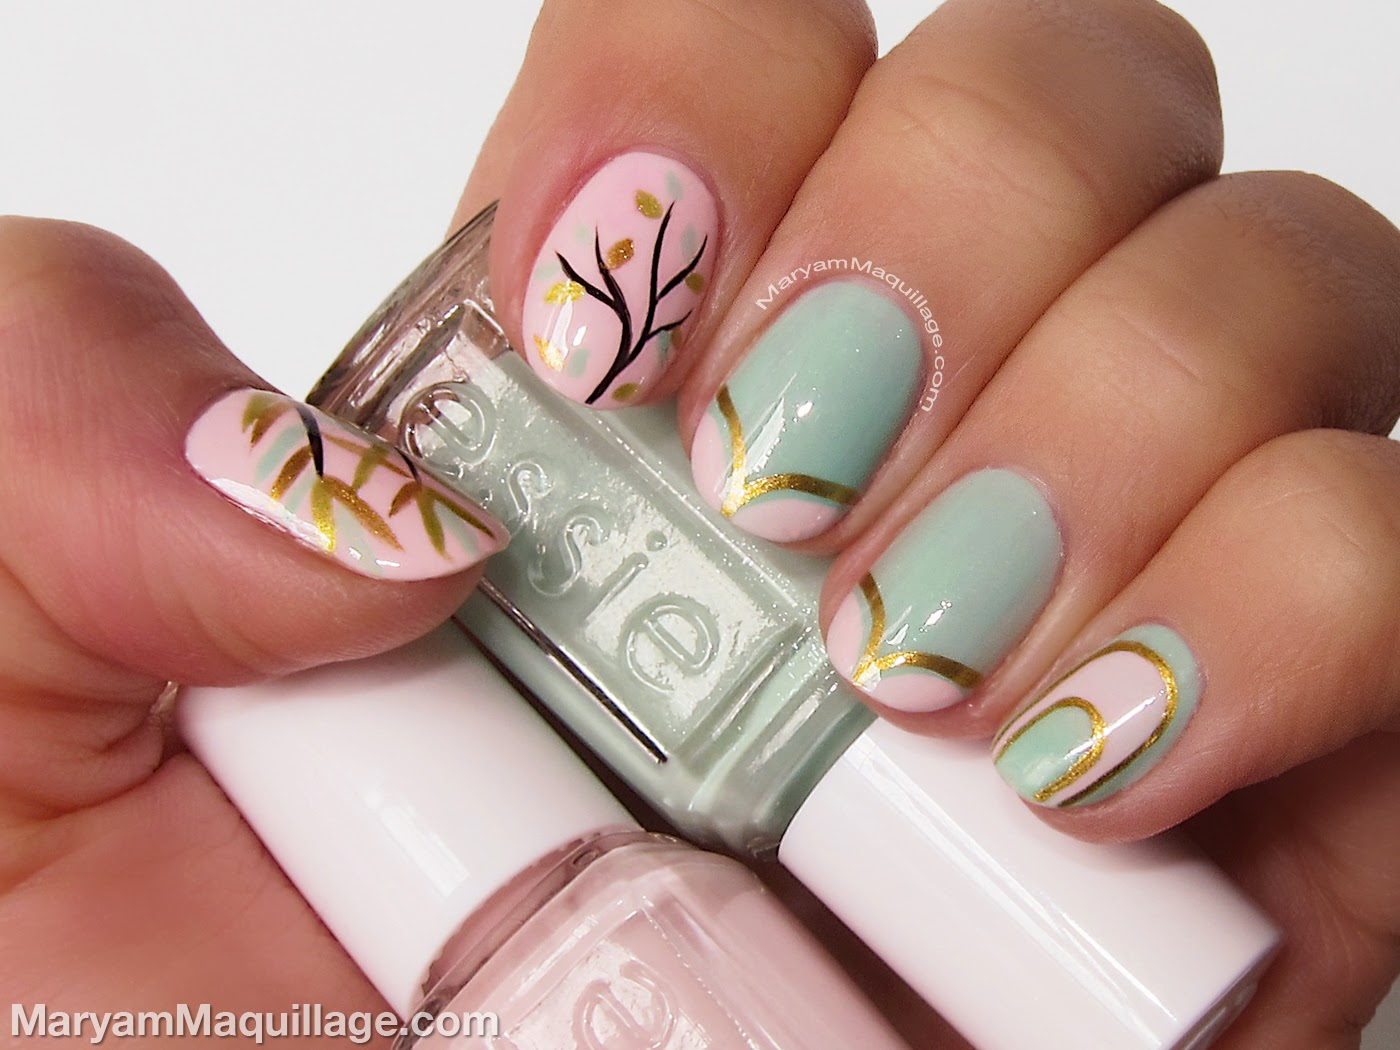 Maryam Maquillage Spring Beauty Trend Pastel Nailart